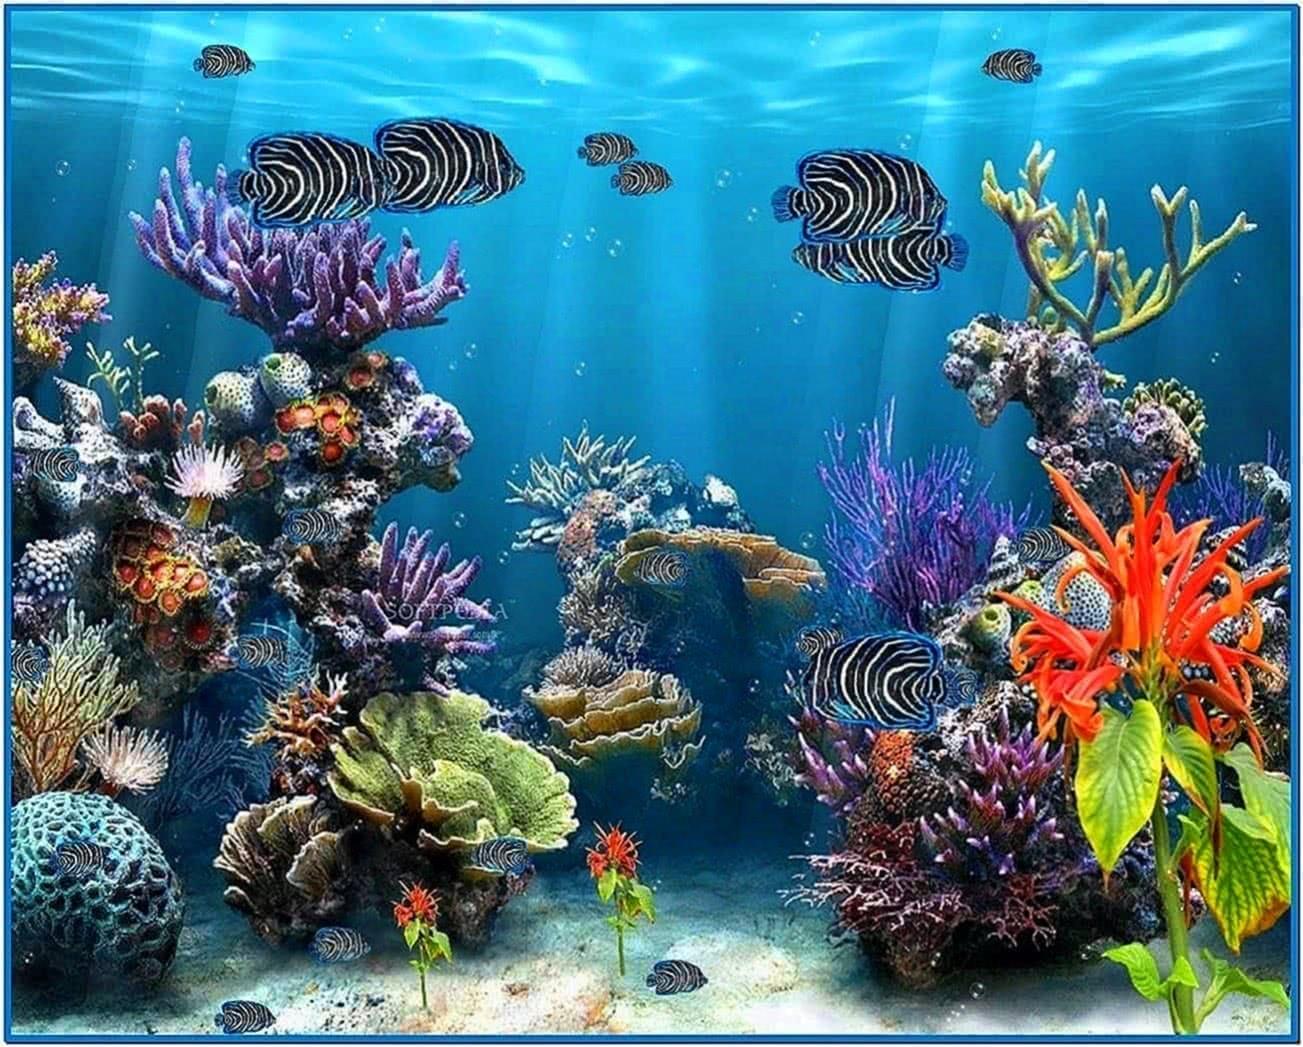 Fish tank screensaver full version